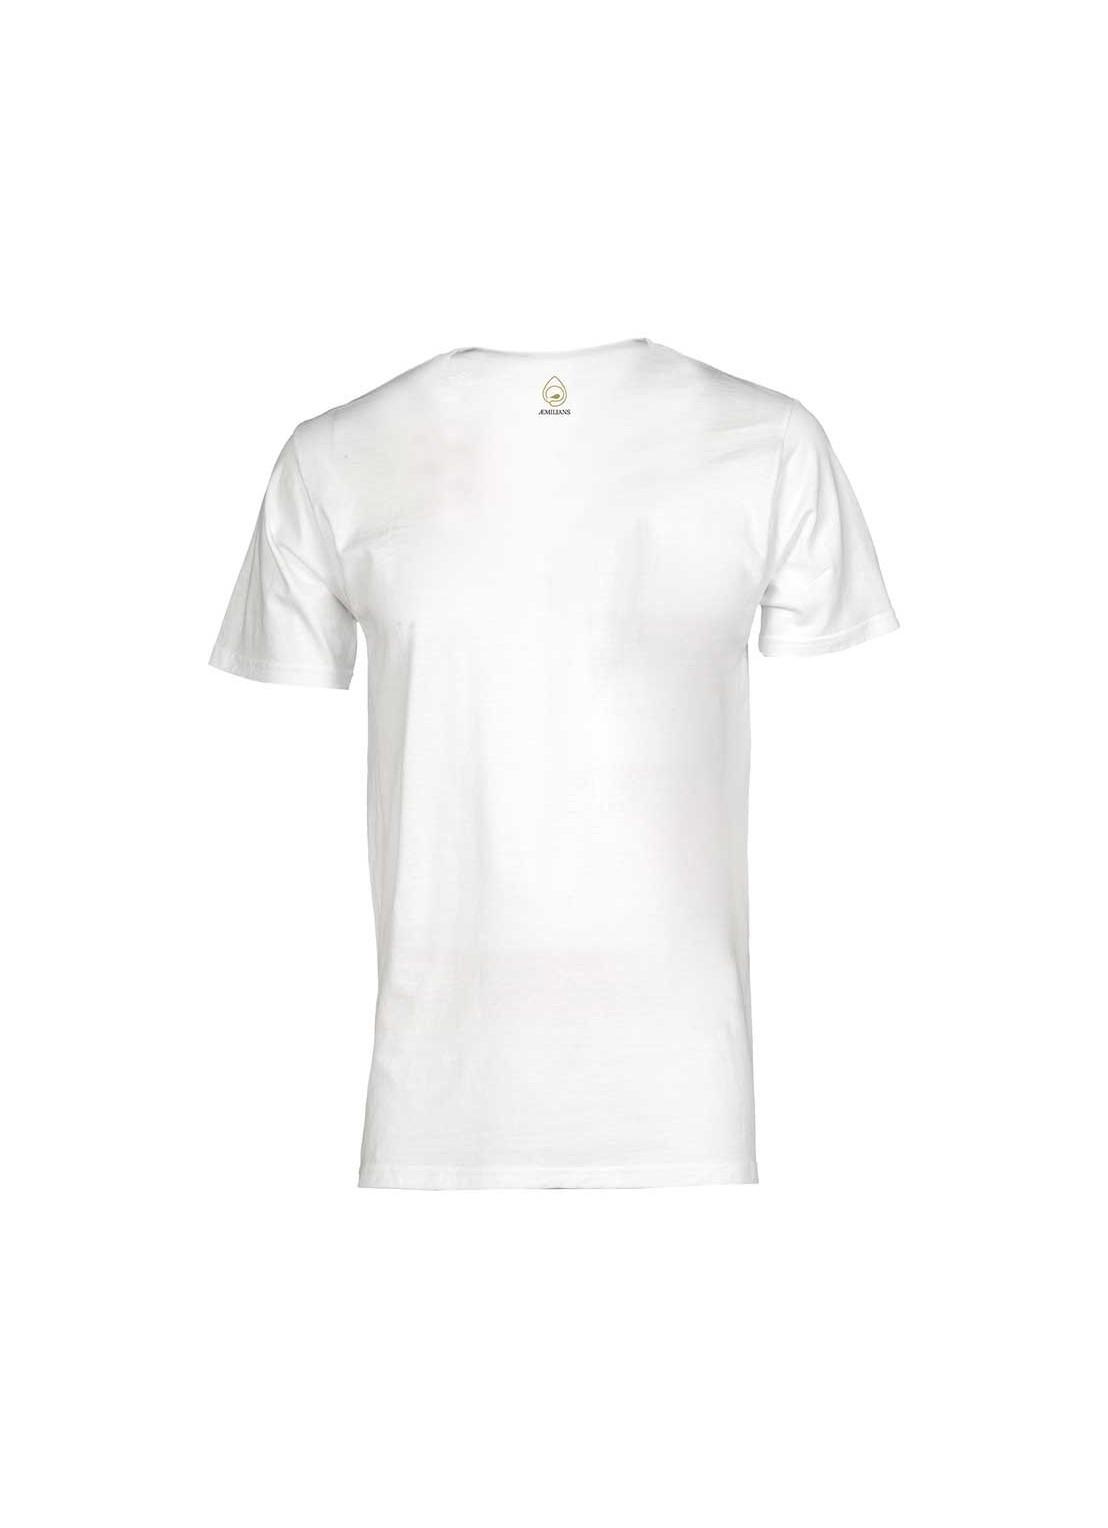 T-shirt MAGELLANO C/FOTO donna bianca